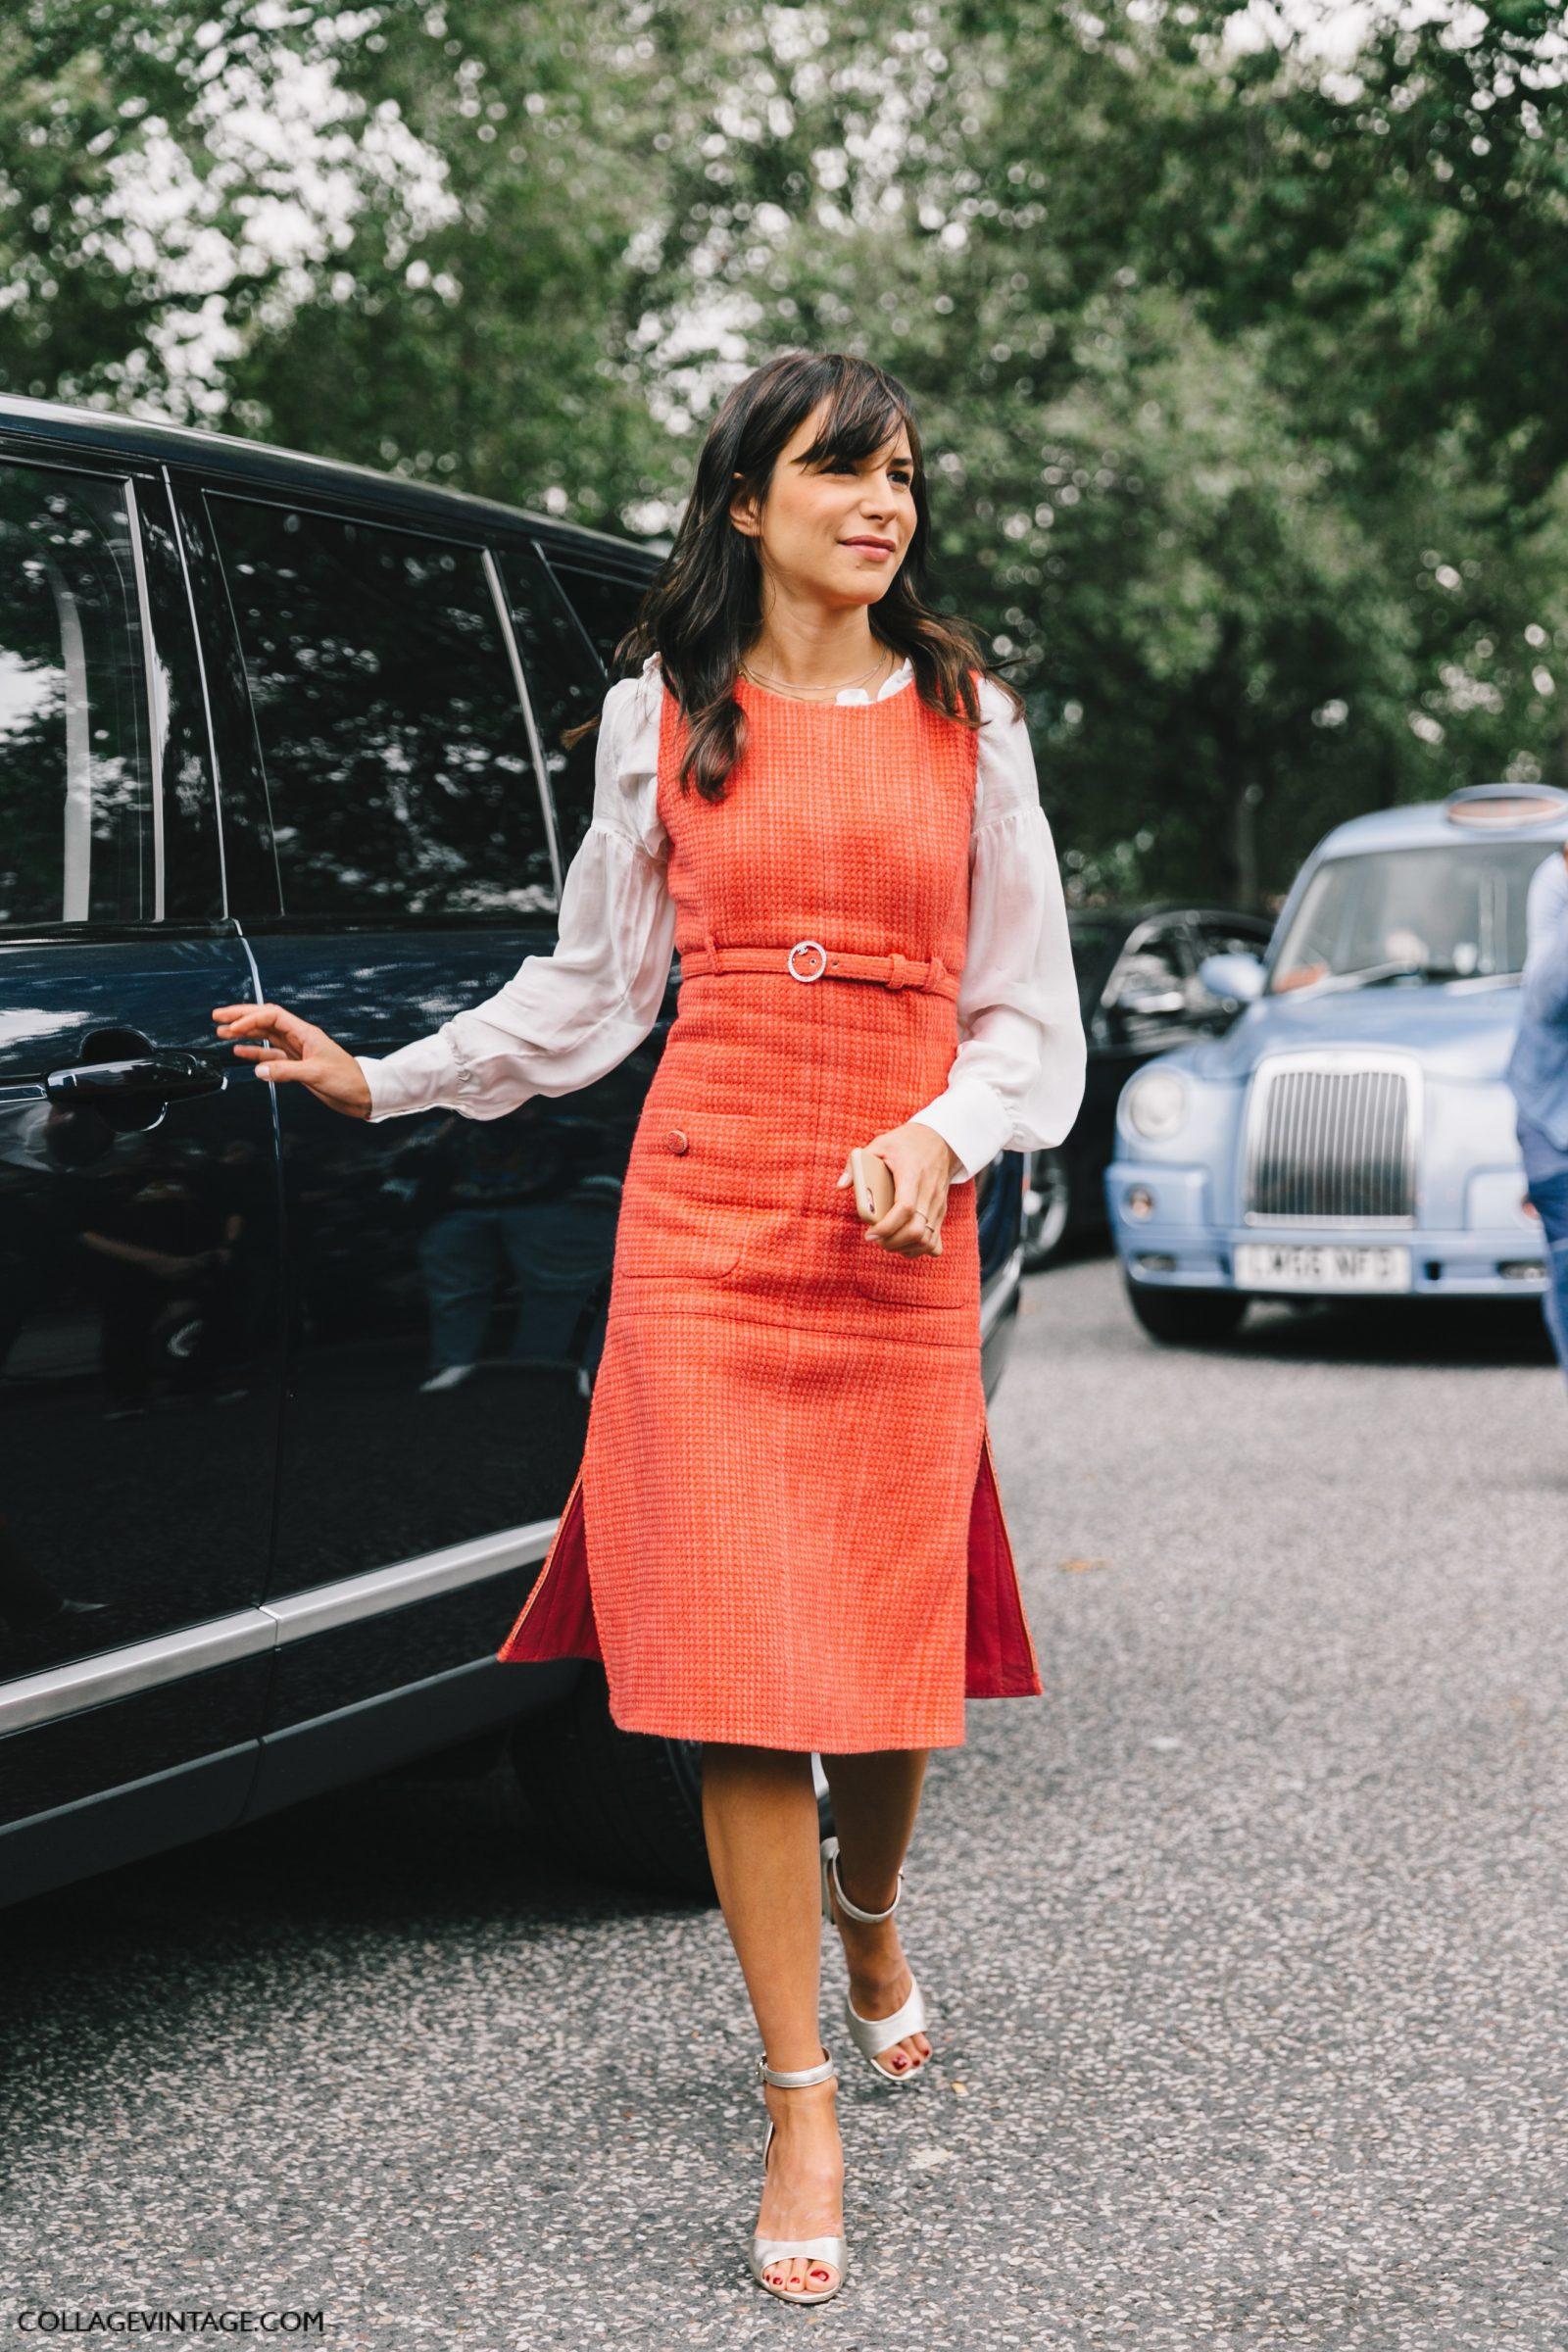 lfw-london_fashion_week_ss17-street_style-outfits-collage_vintage-vintage-roksanda-christopher_kane-joseph-96